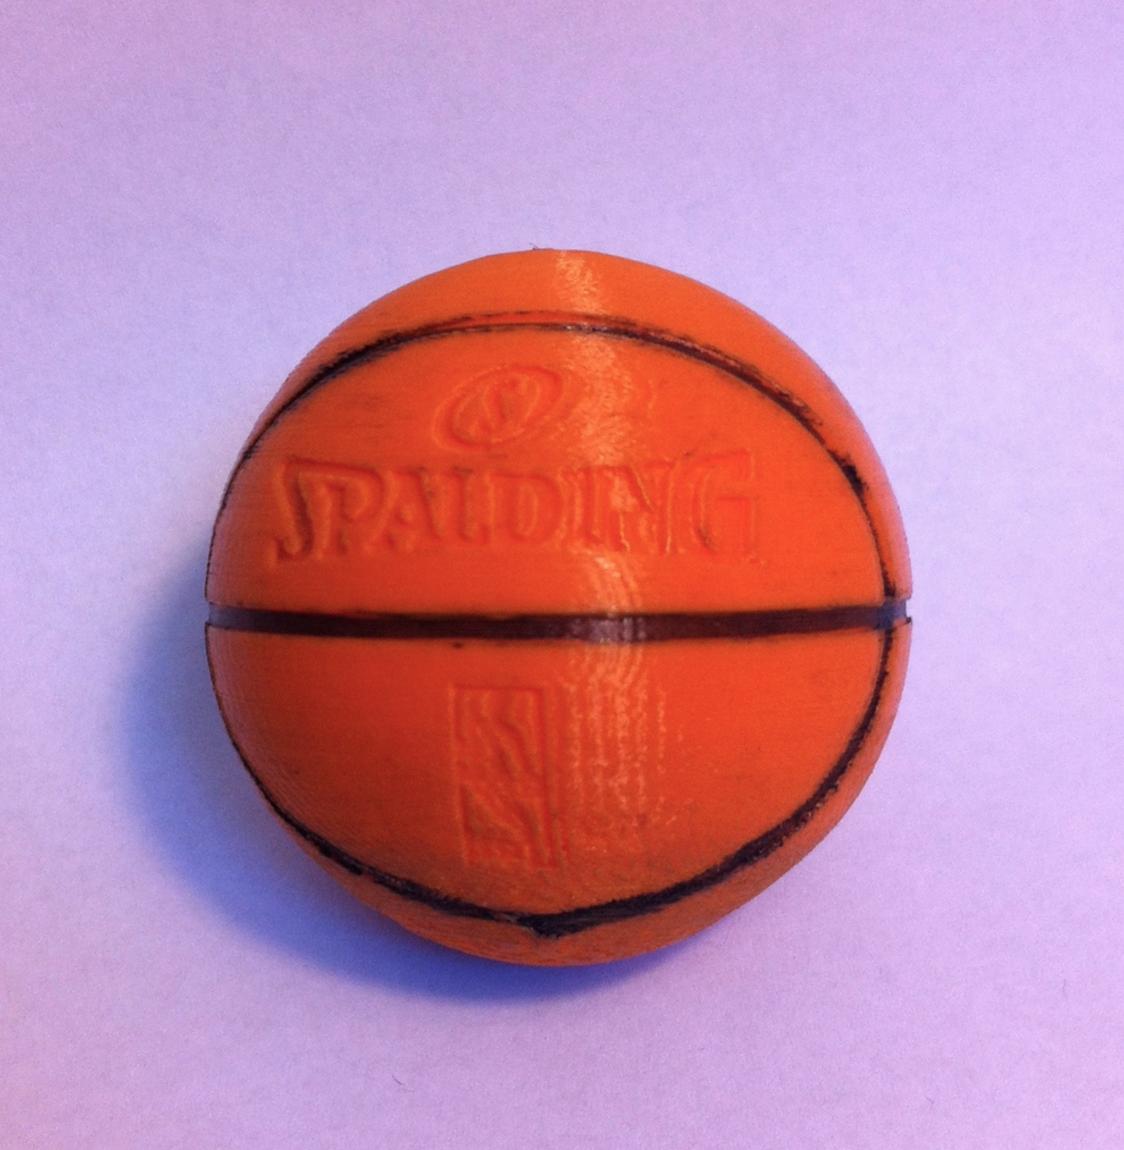 Capture d'écran 2016-12-08 à 12.27.29.png Download free STL file Spalding Basketball • 3D printable model, Mathi_